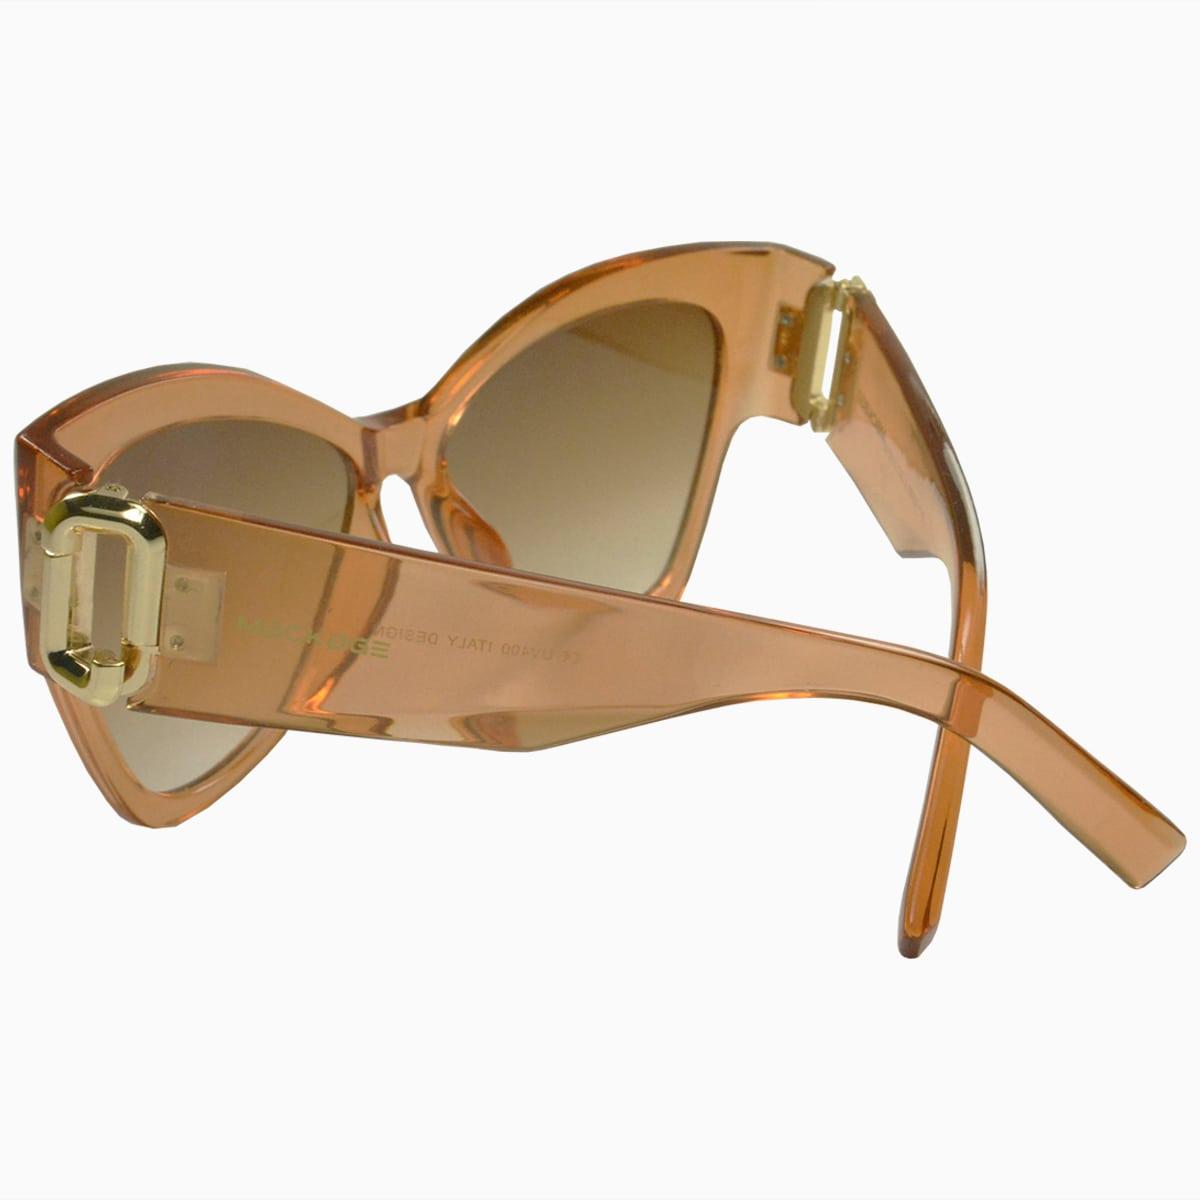 Óculos de Sol Mackage Feminino Acetato Oversize Butterfly - Nude